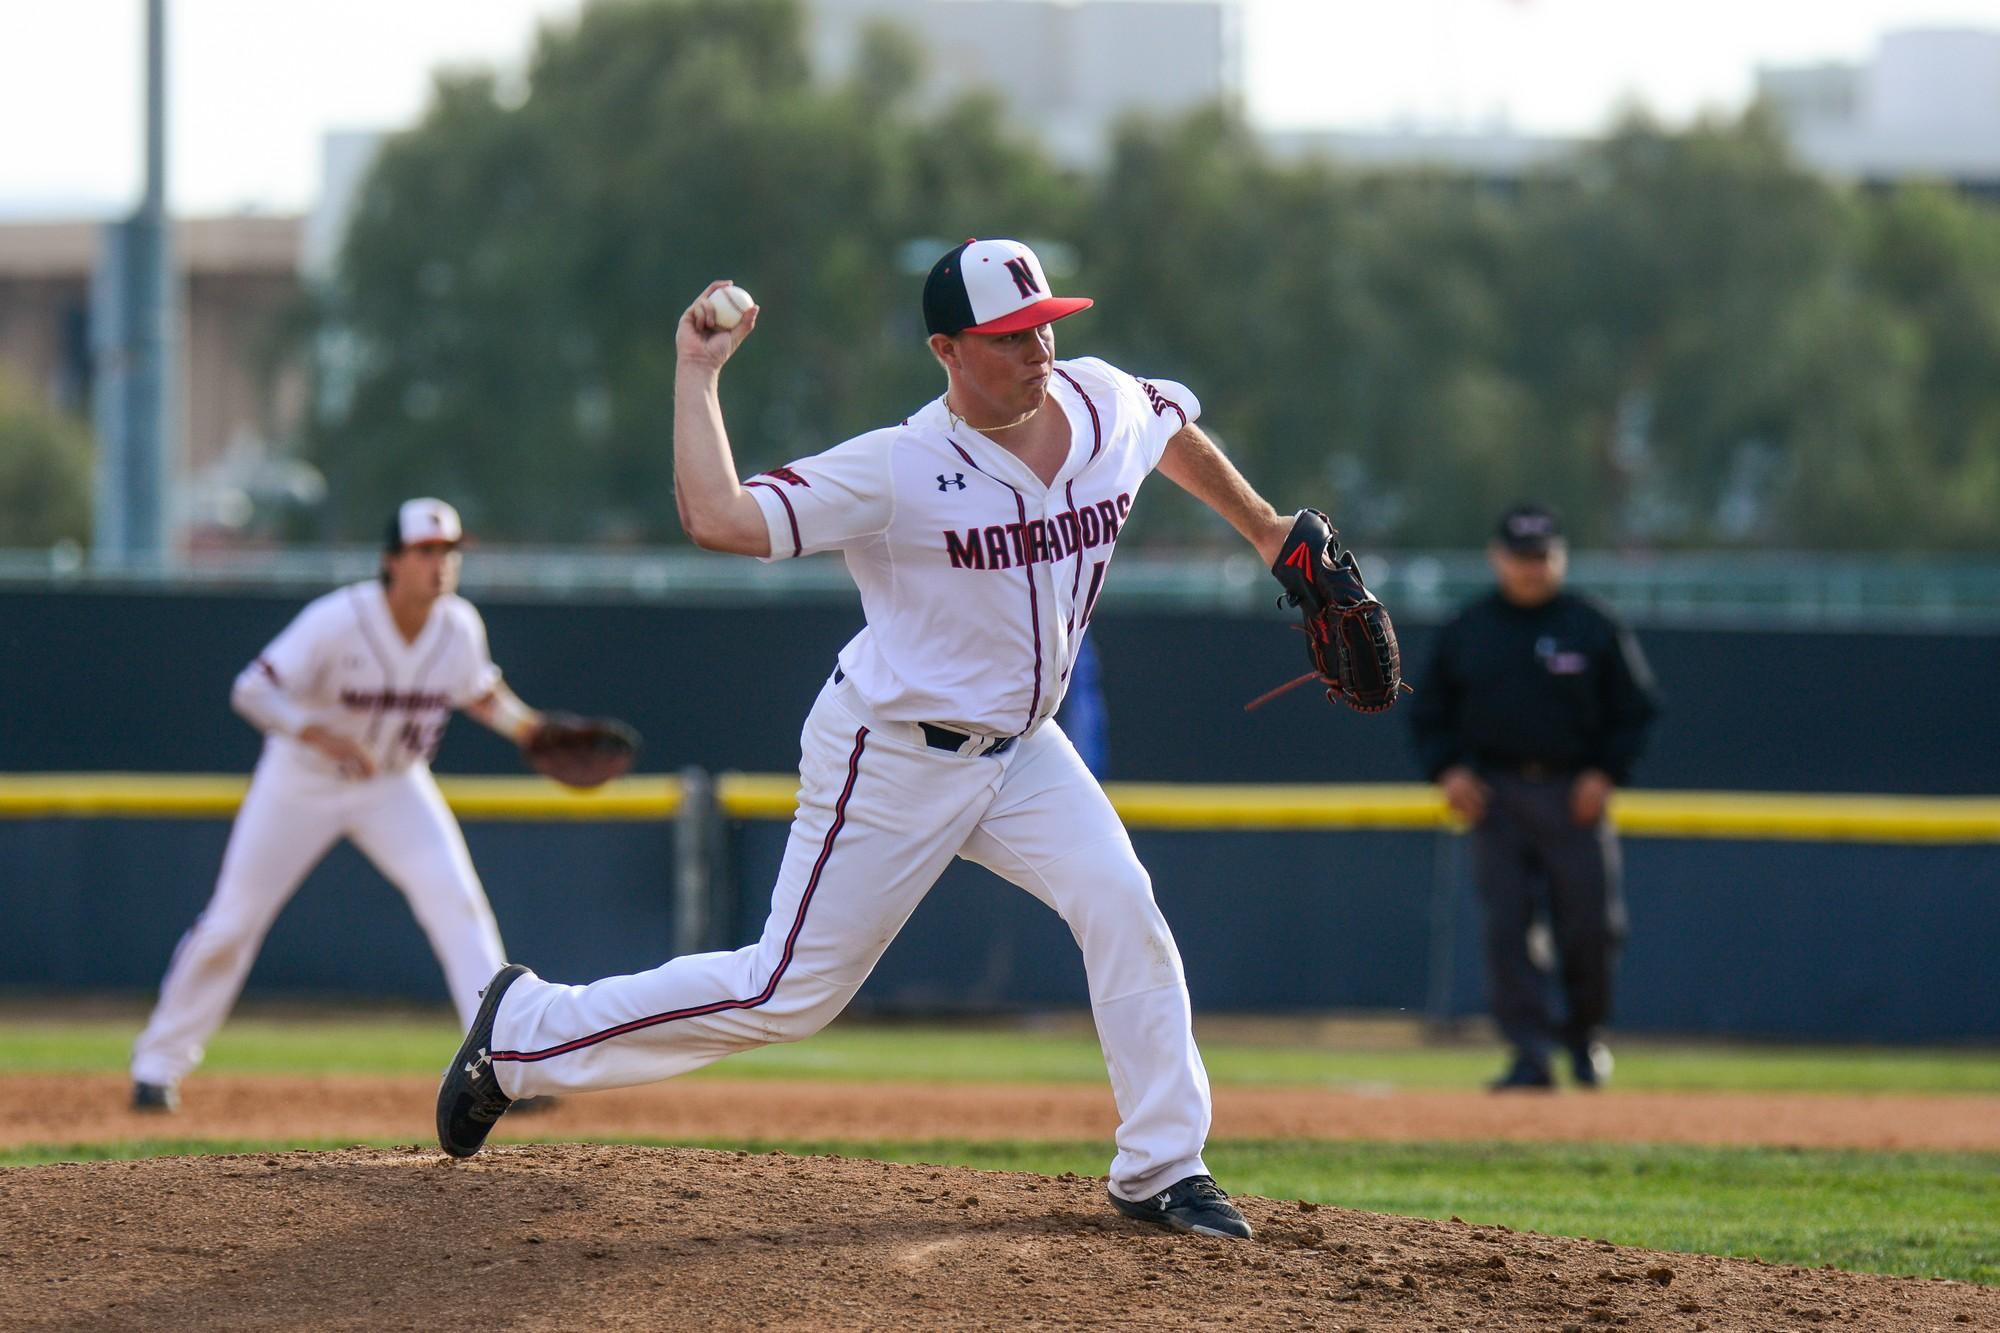 A CSUN men's Baseball pitcher throwing a pitch